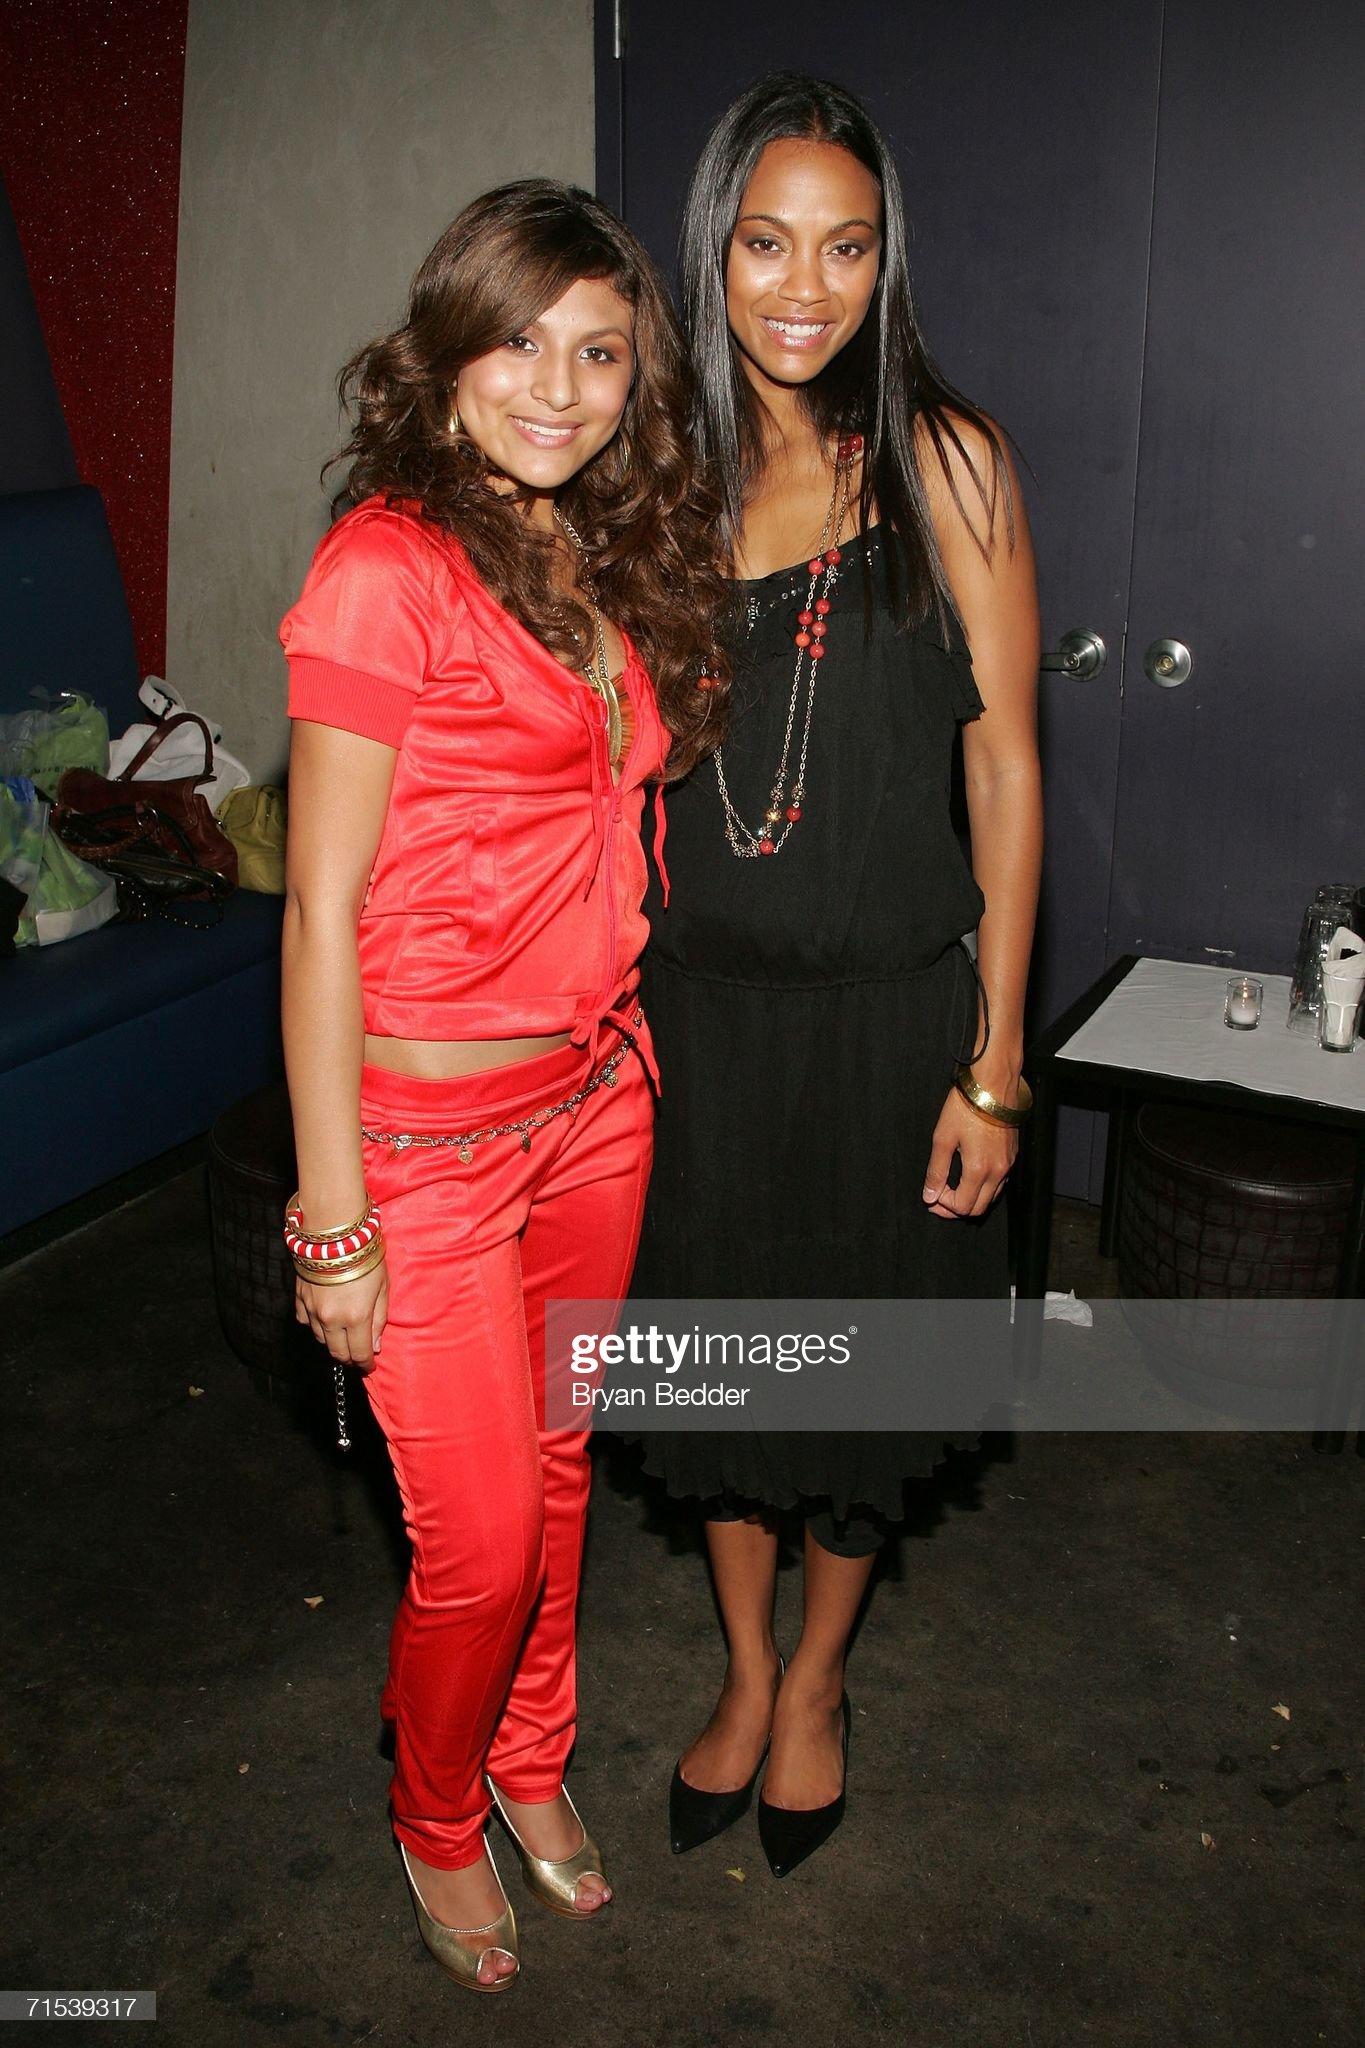 ¿Cuánto mide Paula DeAnda? - Altura - Real height Singer-paula-deanda-and-actress-zoe-saldana-attend-the-closing-night-picture-id71539317?s=2048x2048